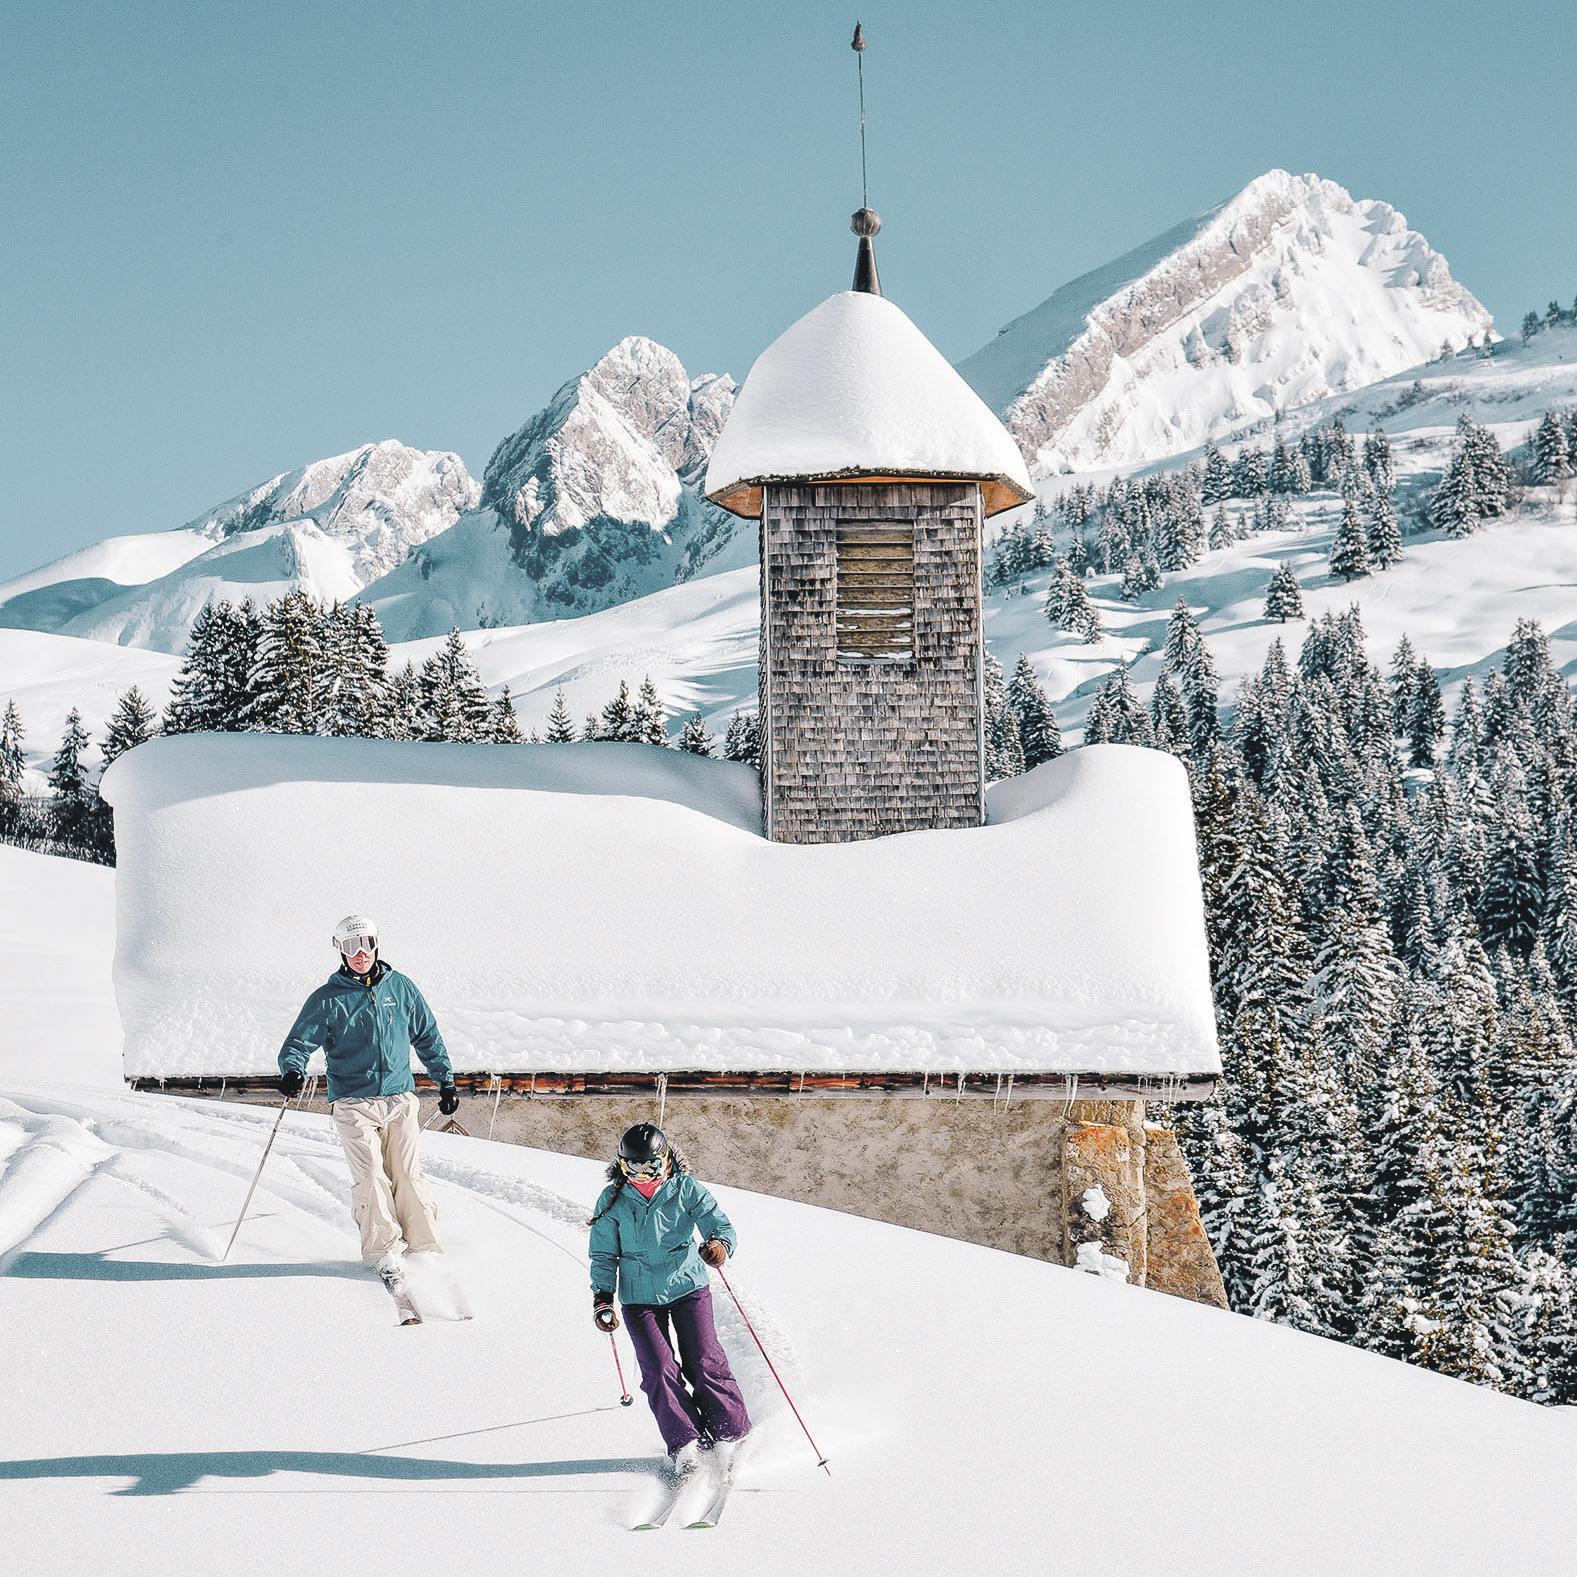 h16-1653-ski-d-machet-le-grand-bornand-web-carre-3-200622